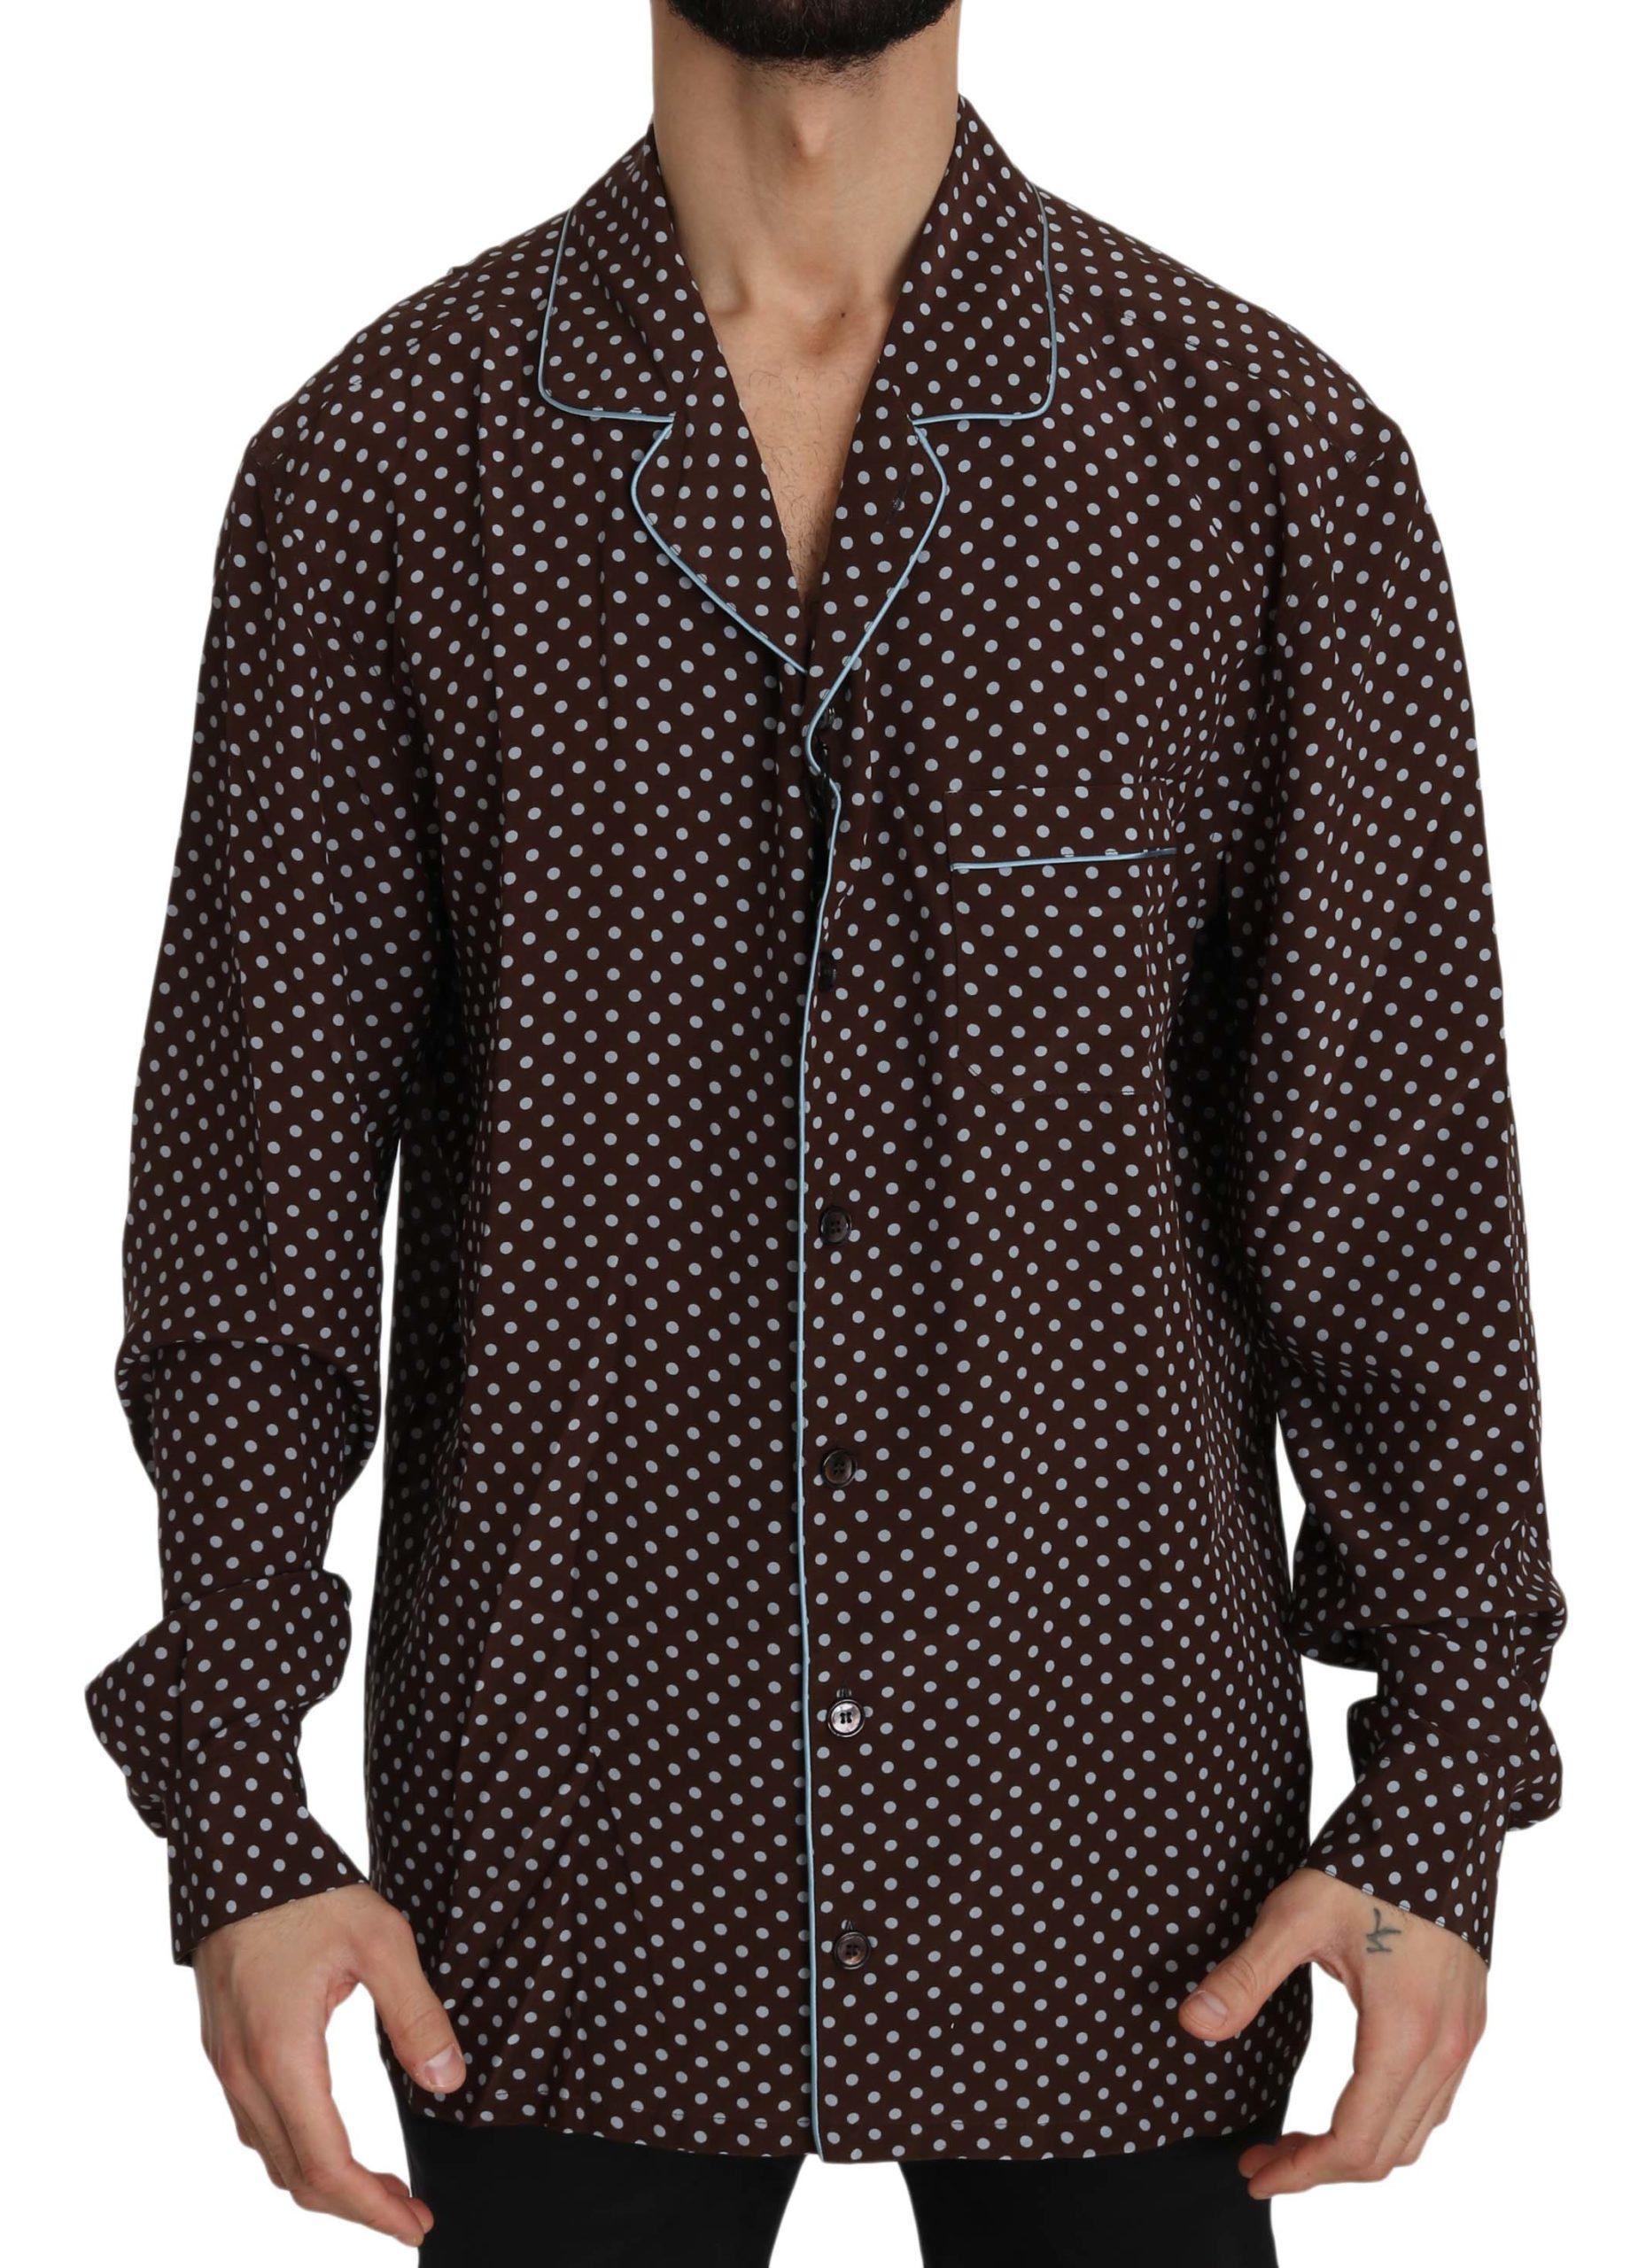 Dolce & Gabbana Men's Shirt Brown TSH3361 - IT39 | S